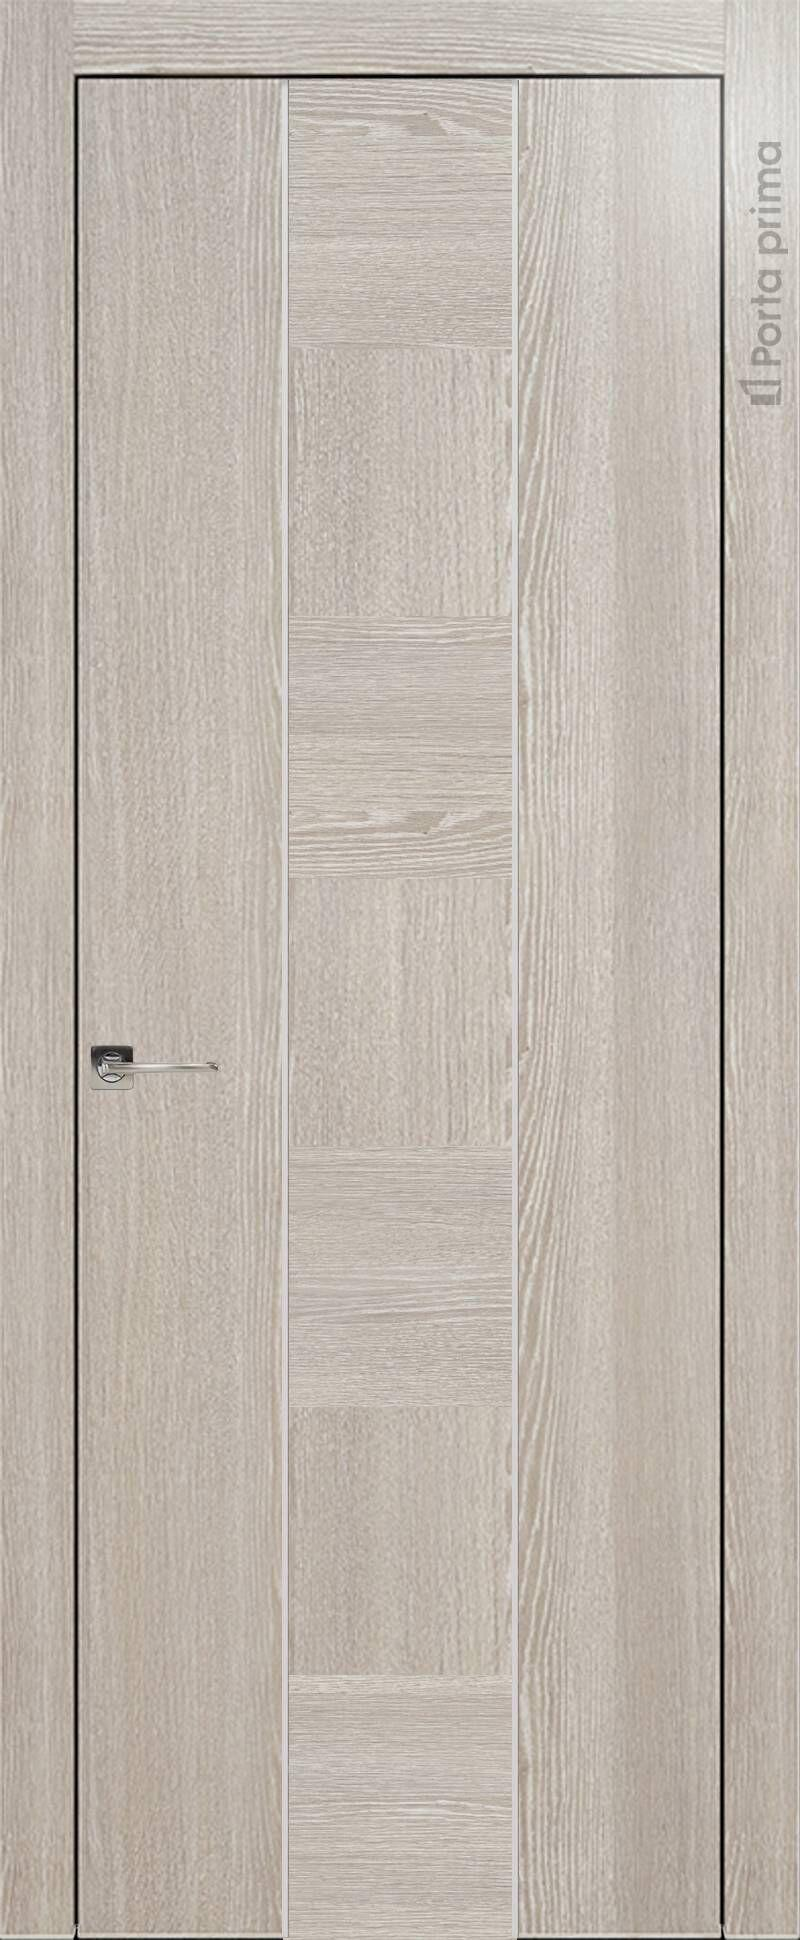 Tivoli Б-1 цвет - Серый дуб Без стекла (ДГ)